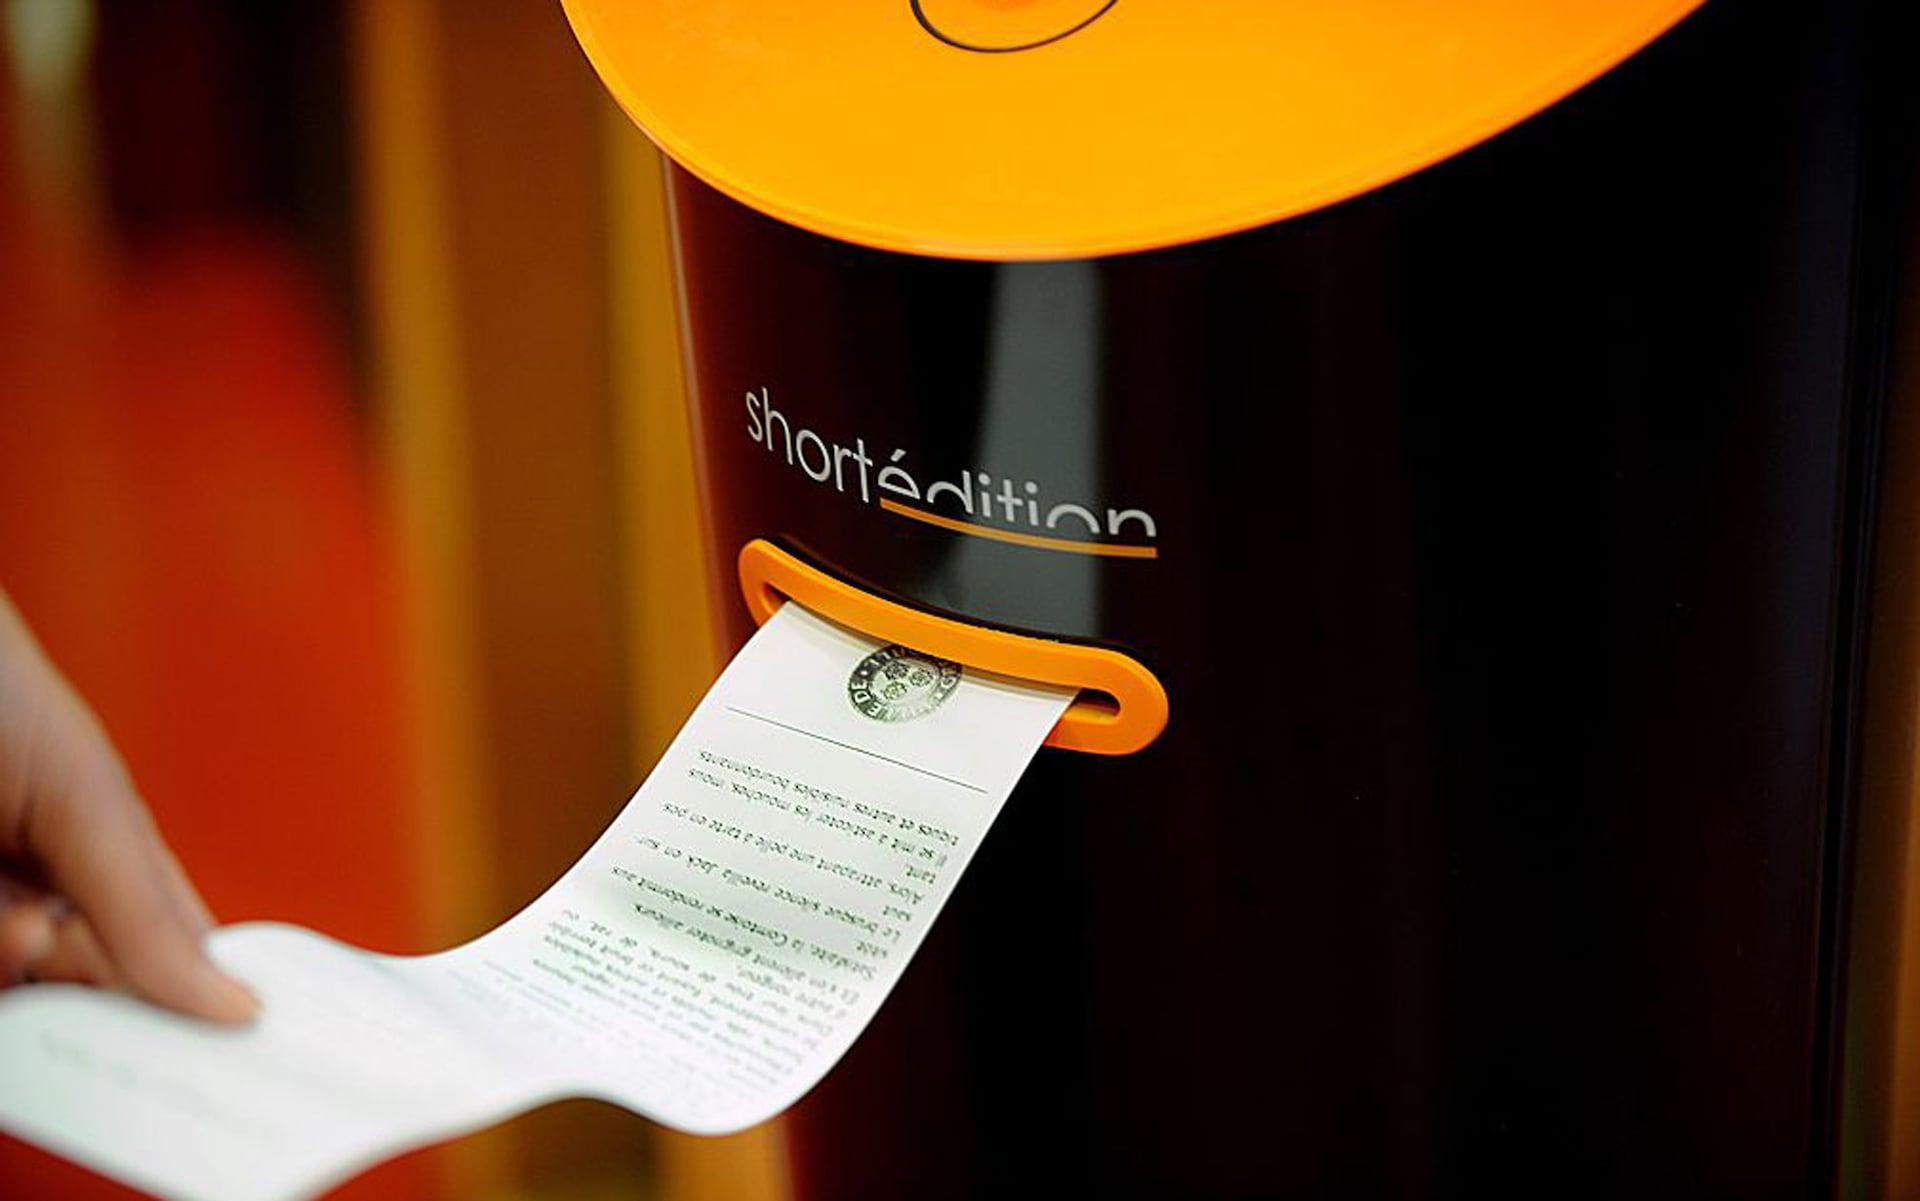 Image de [ UK ] Vending machines dispense short stories to bored French commuters